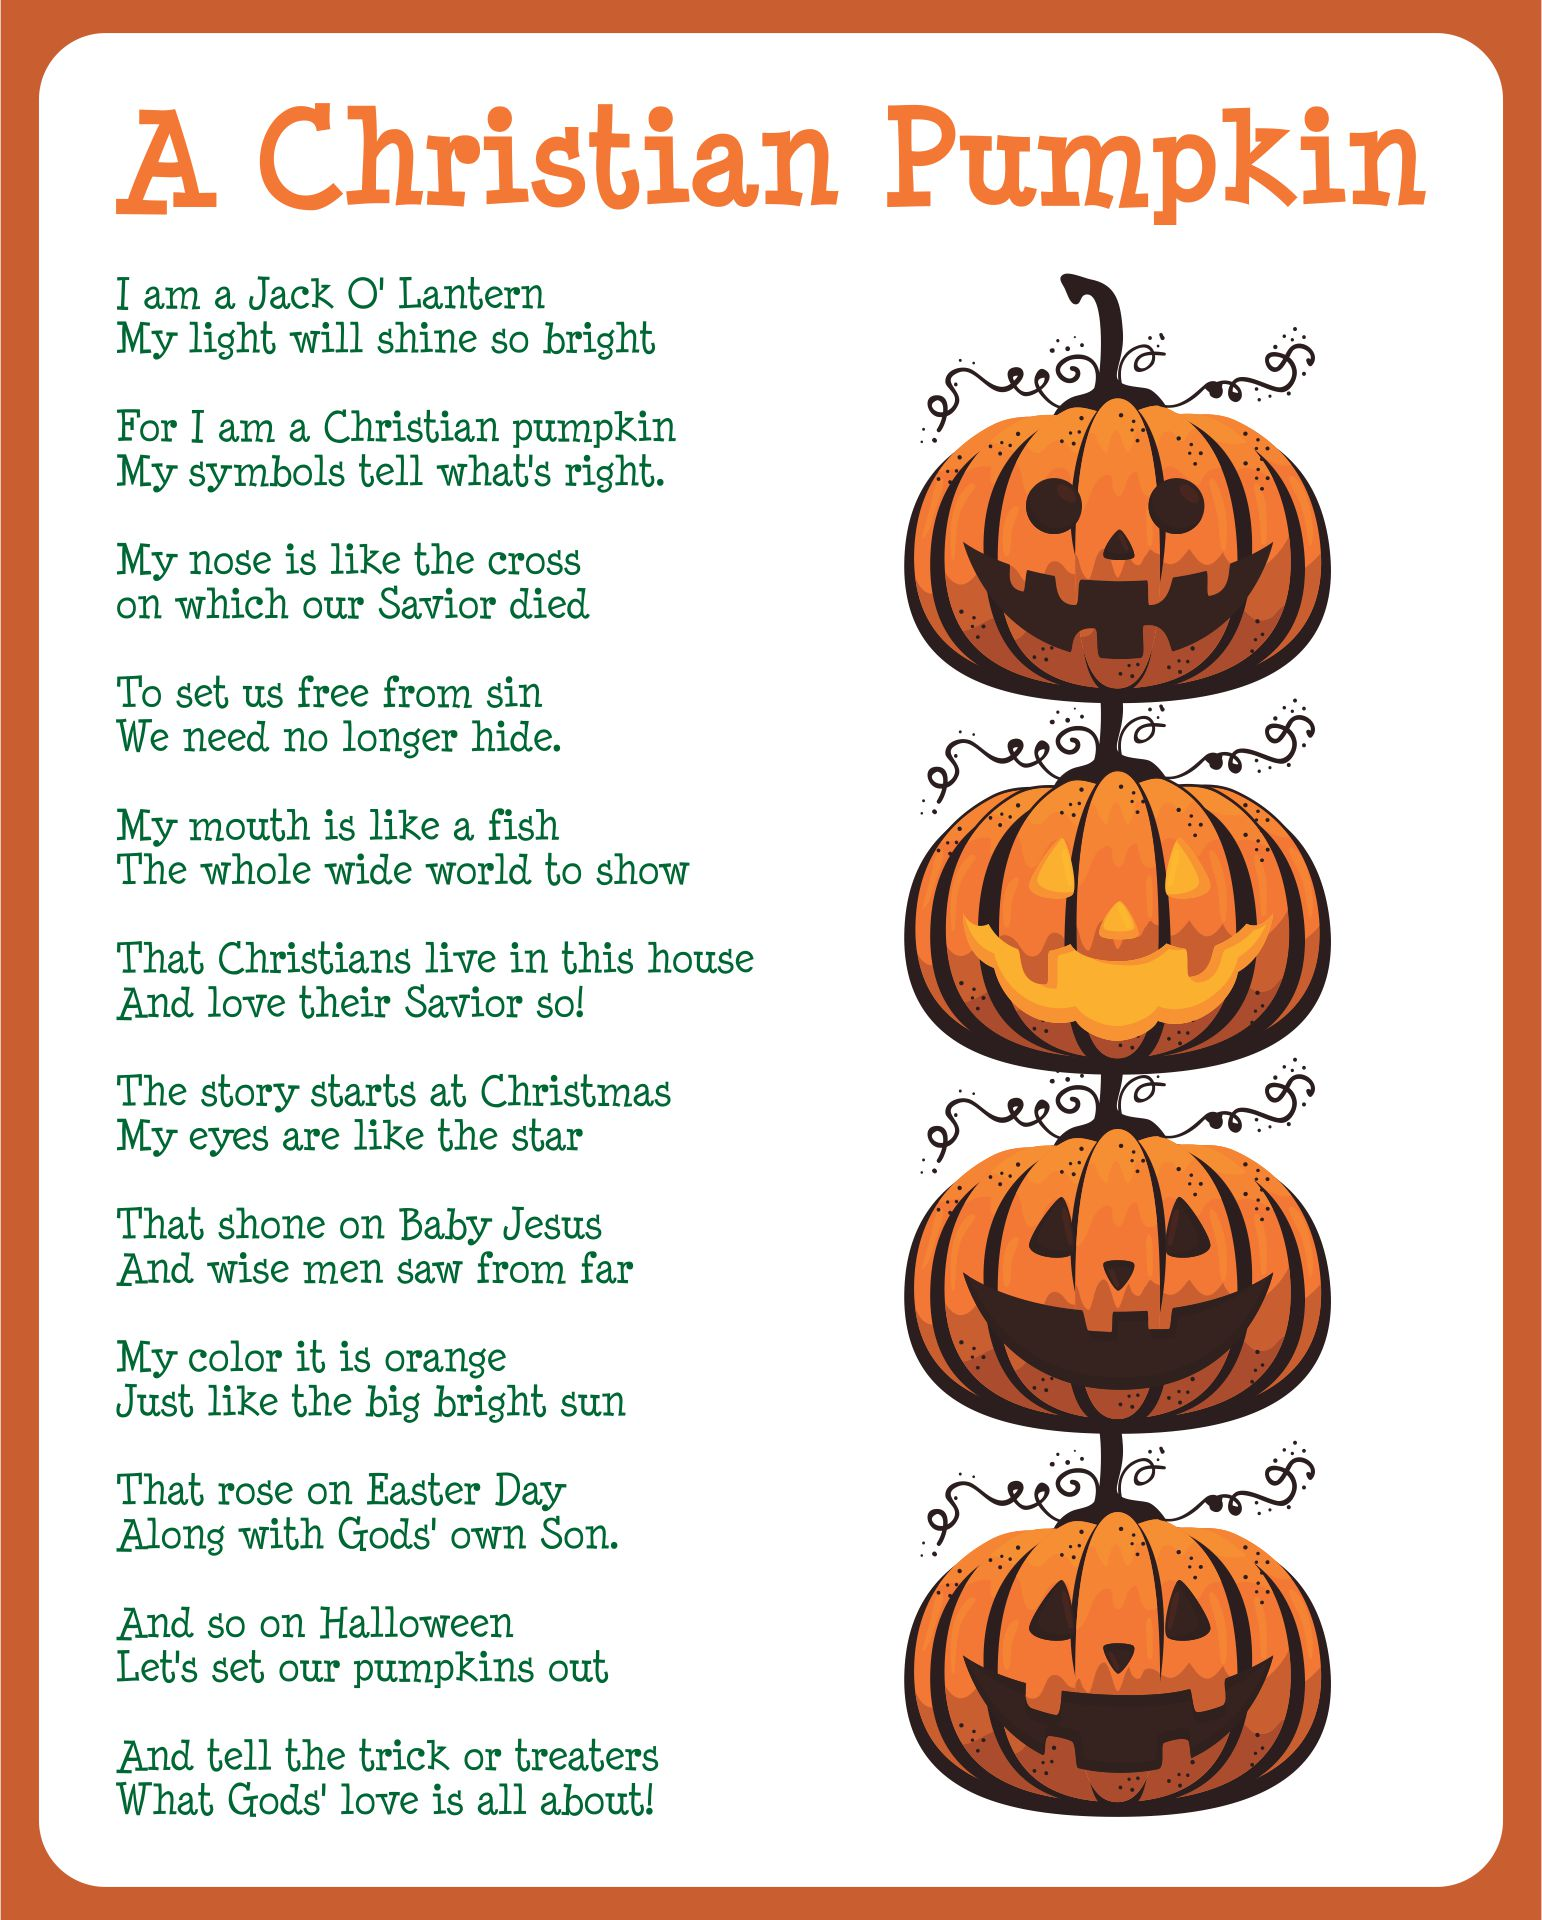 Christian Pumpkin Poem Printable